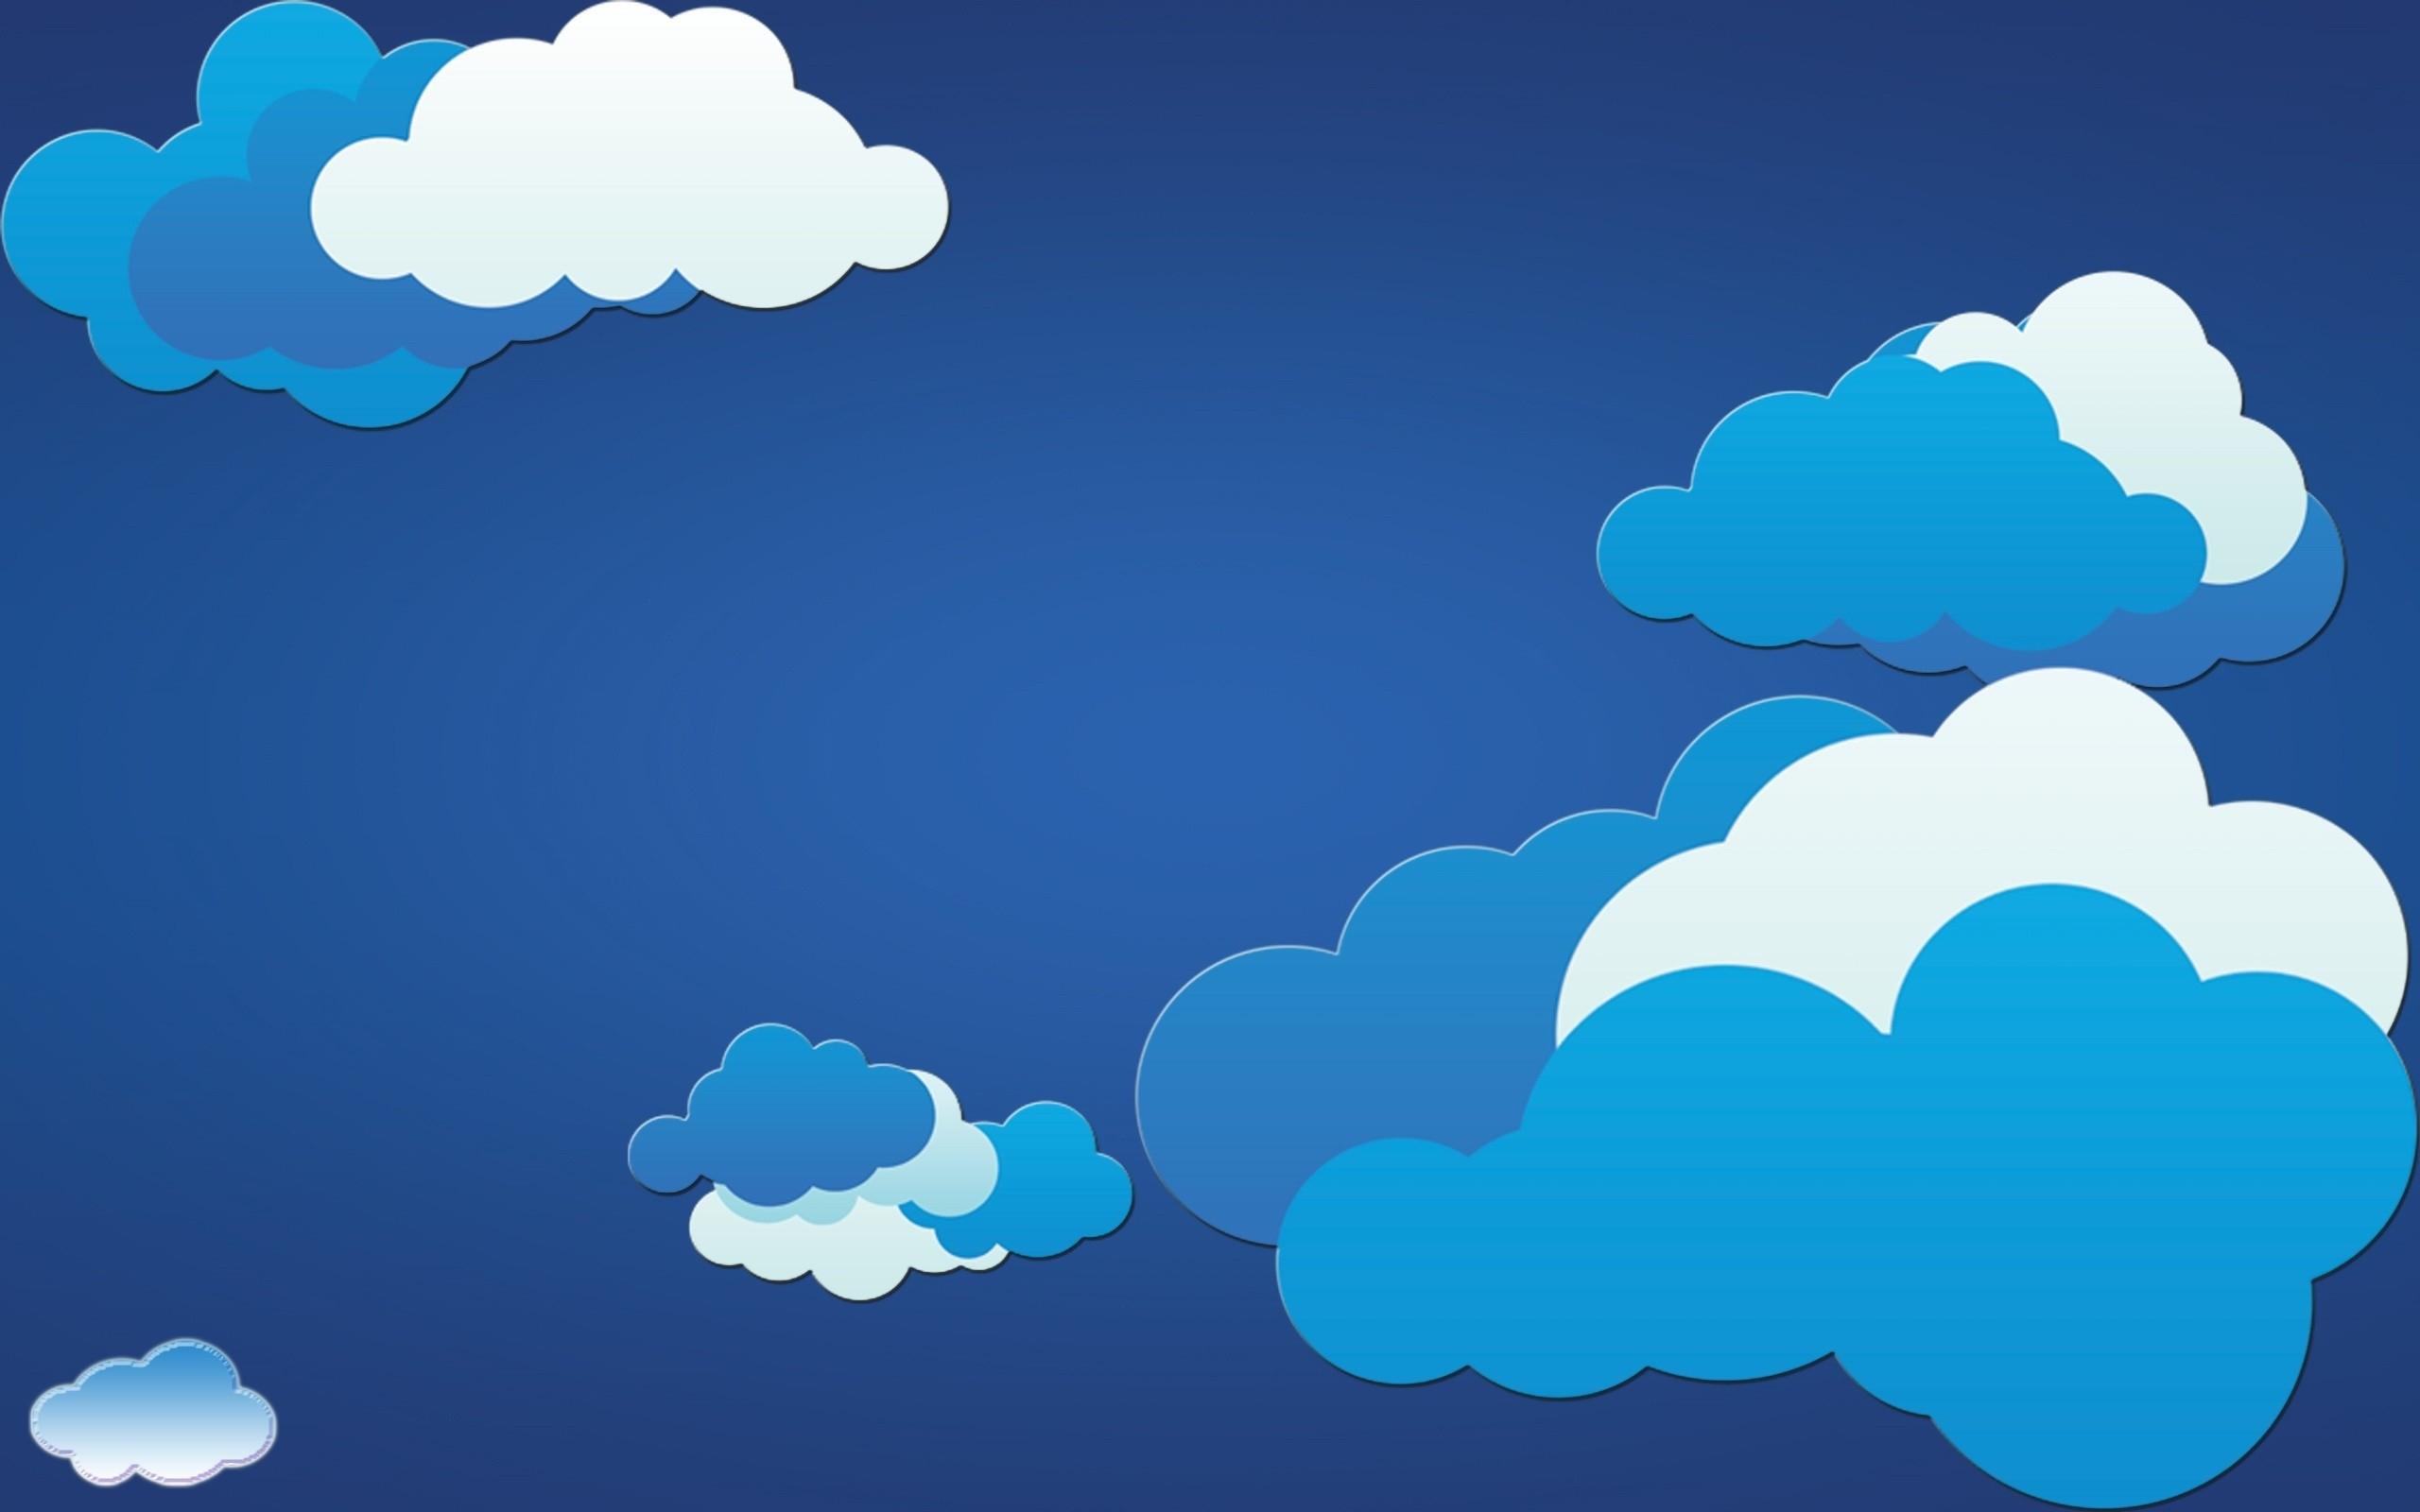 Blue Clouds Wallpaper 54 Images